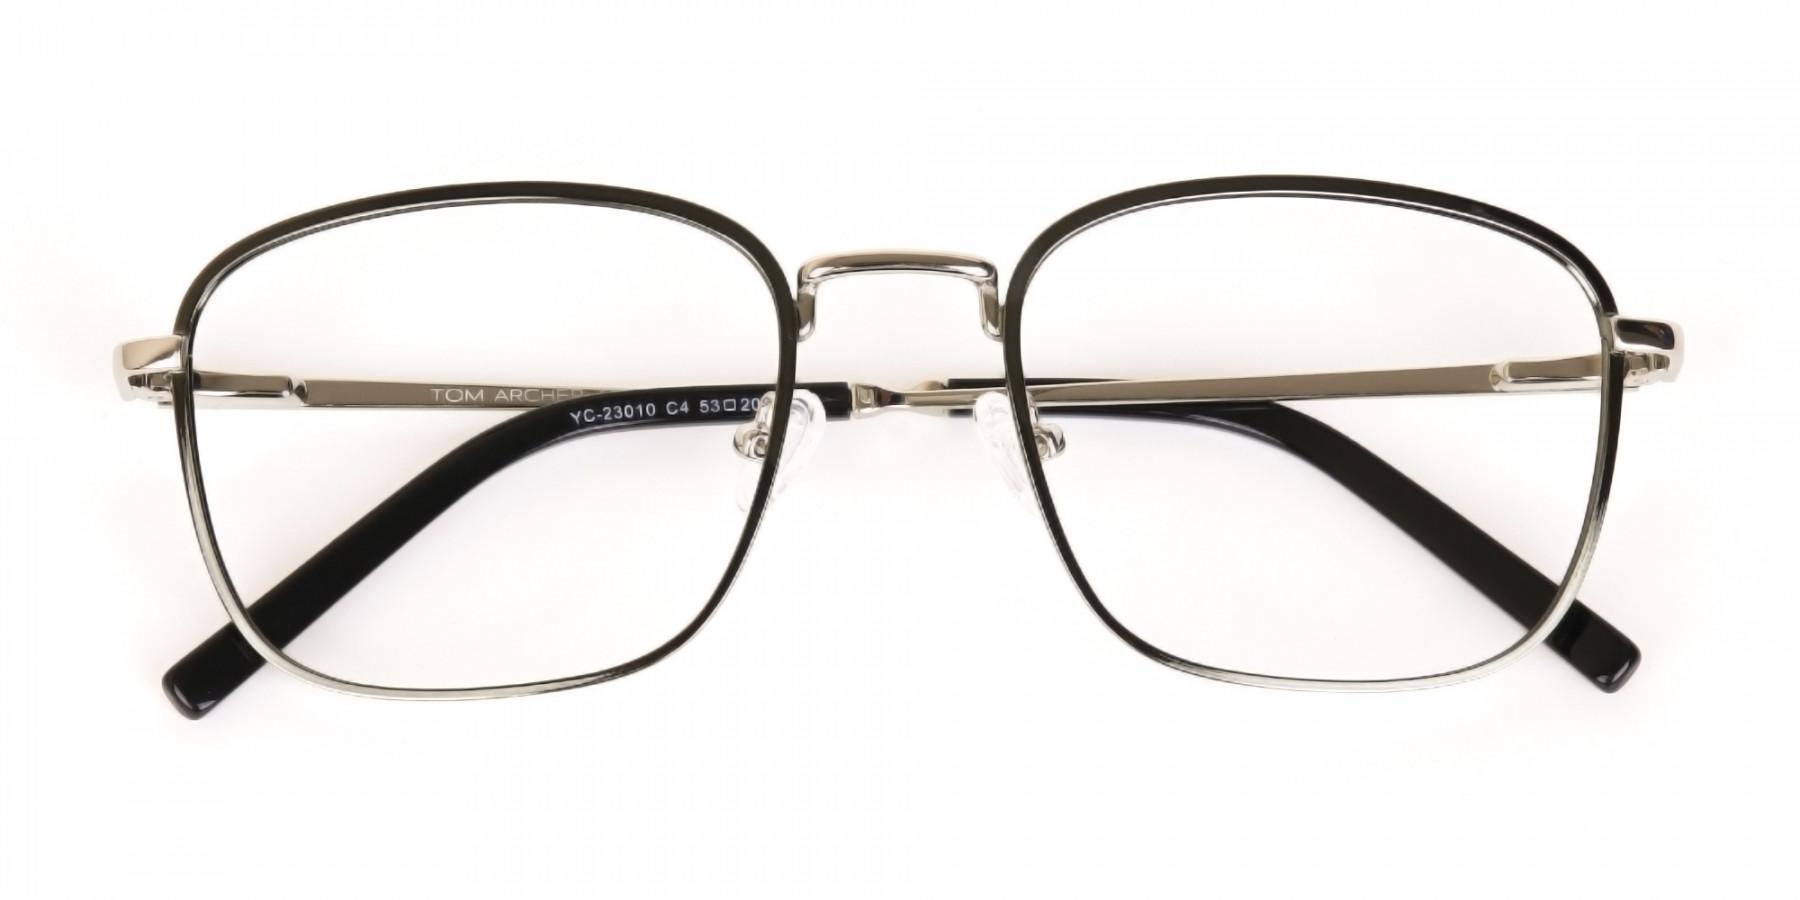 Silver Green Metal Wayfarer Glasses Frame Unisex-1